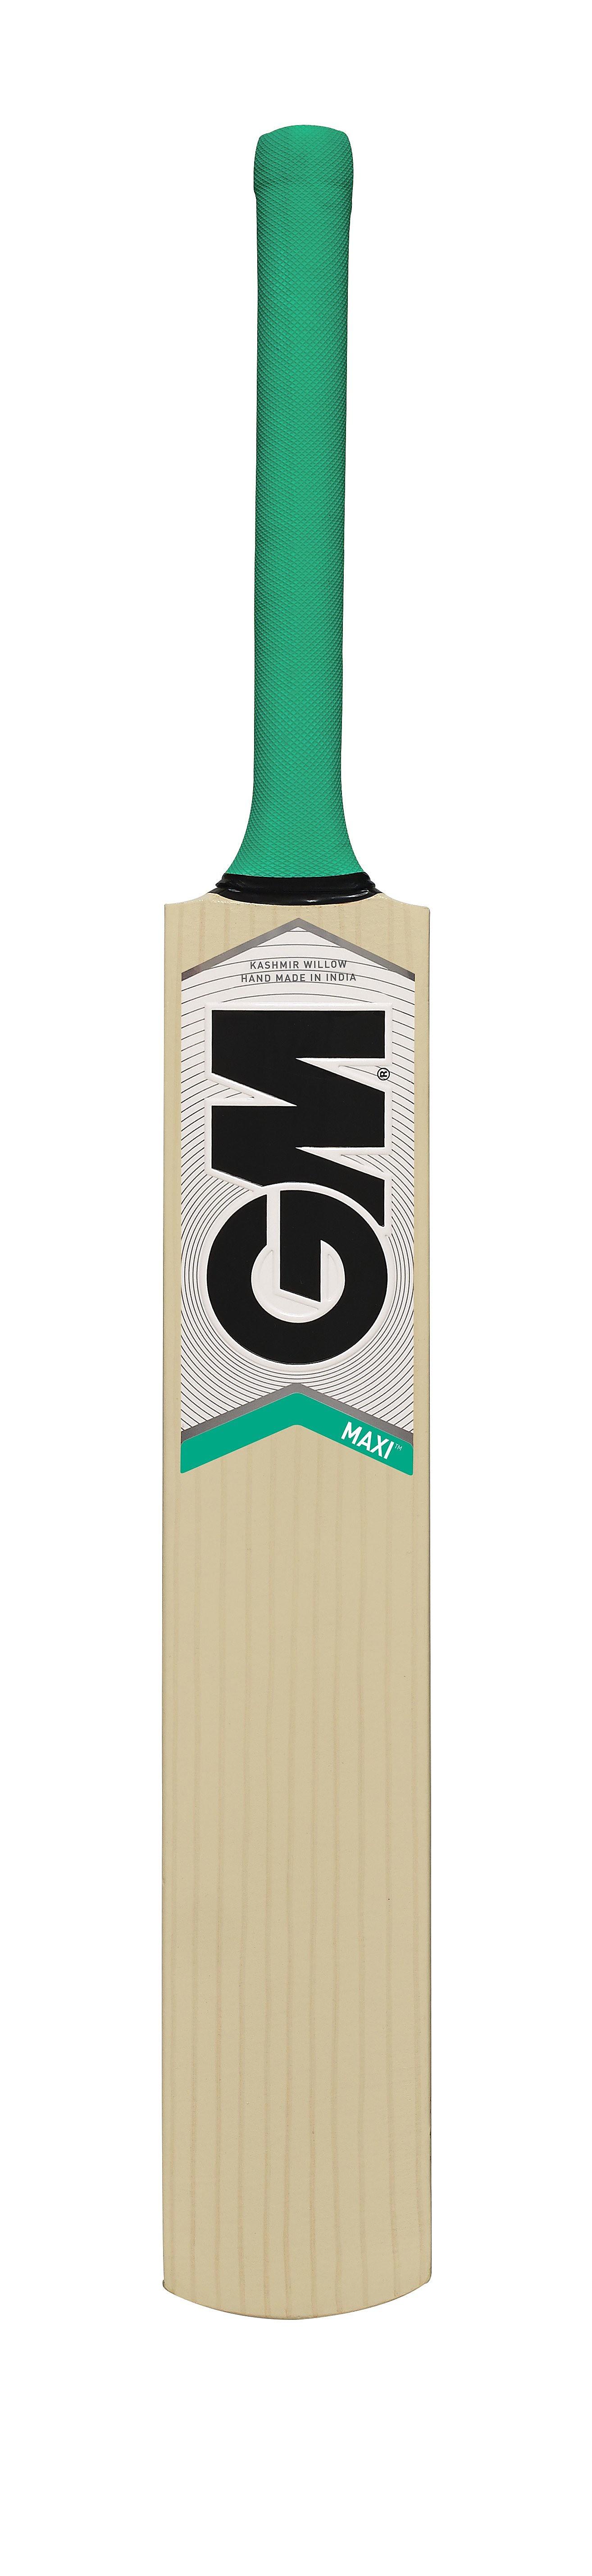 Gunn & Moore MAXI F4.5 DXM 404 Cricket Bat